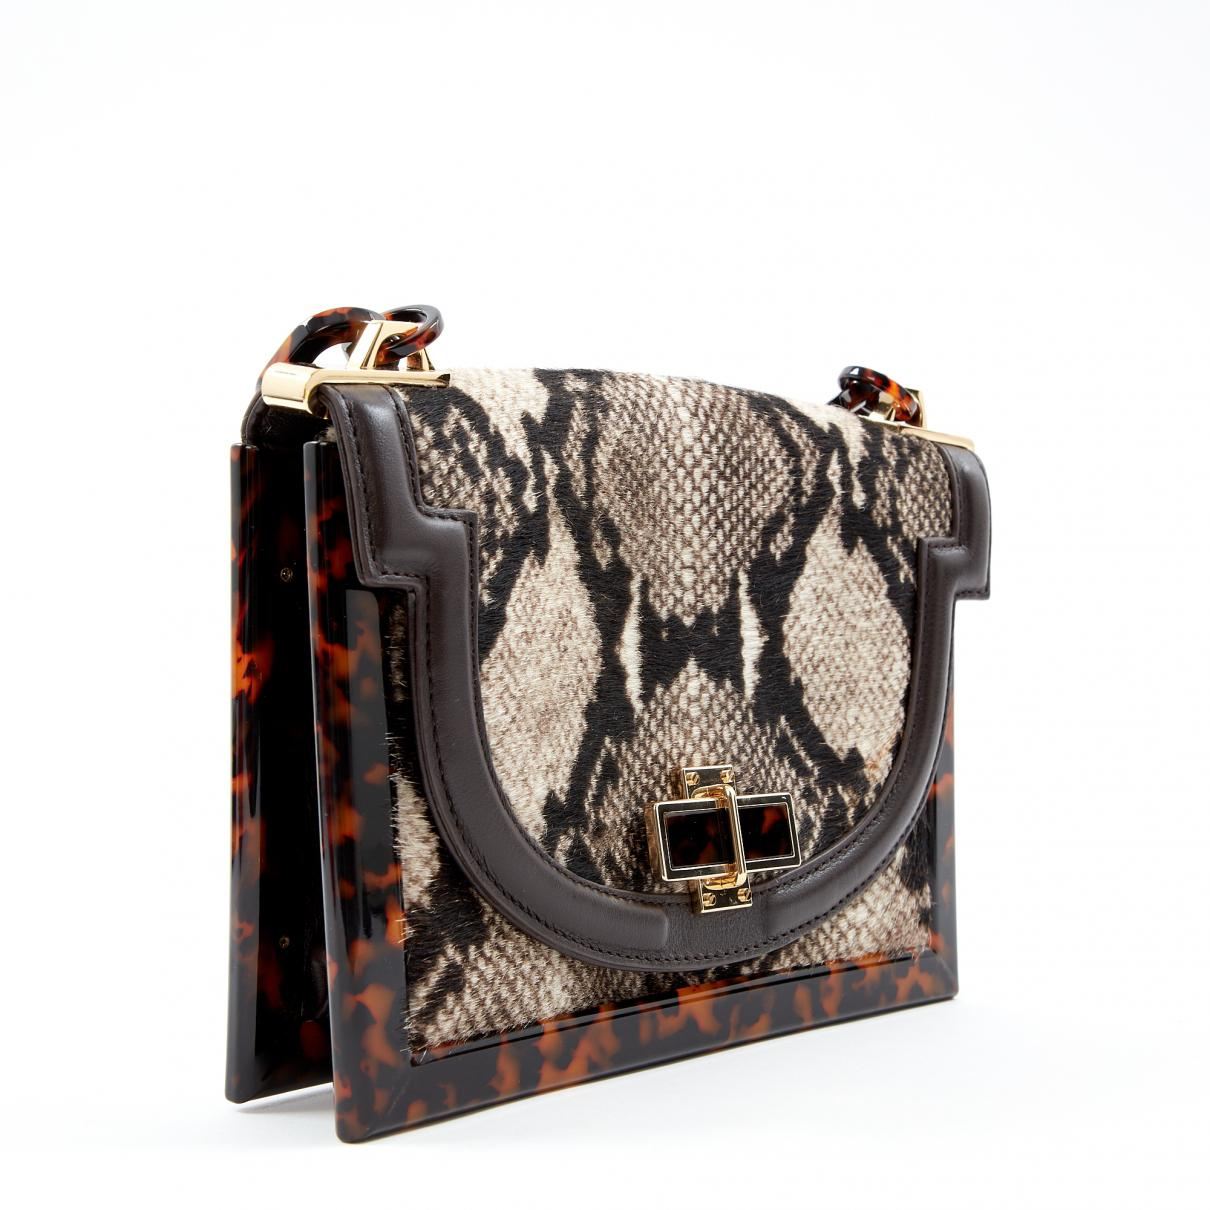 29f54cebf415 ... Multicolour Pony-style Calfskin Handbag - Lyst. View fullscreen